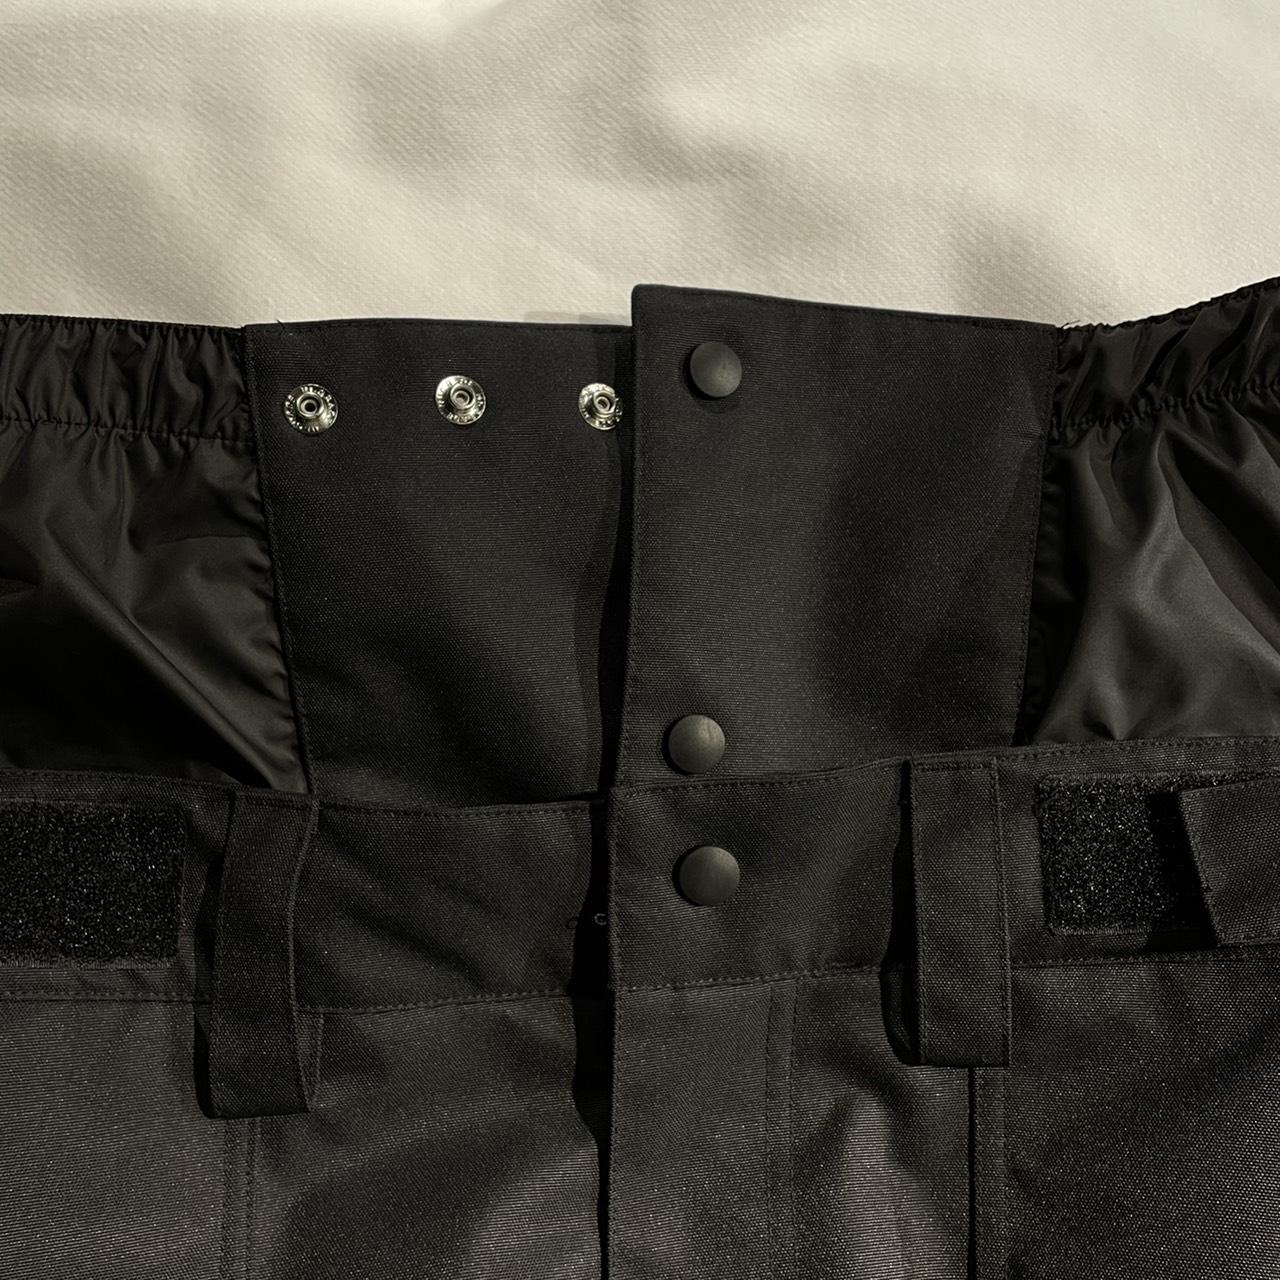 BB7 CARGO PANTS